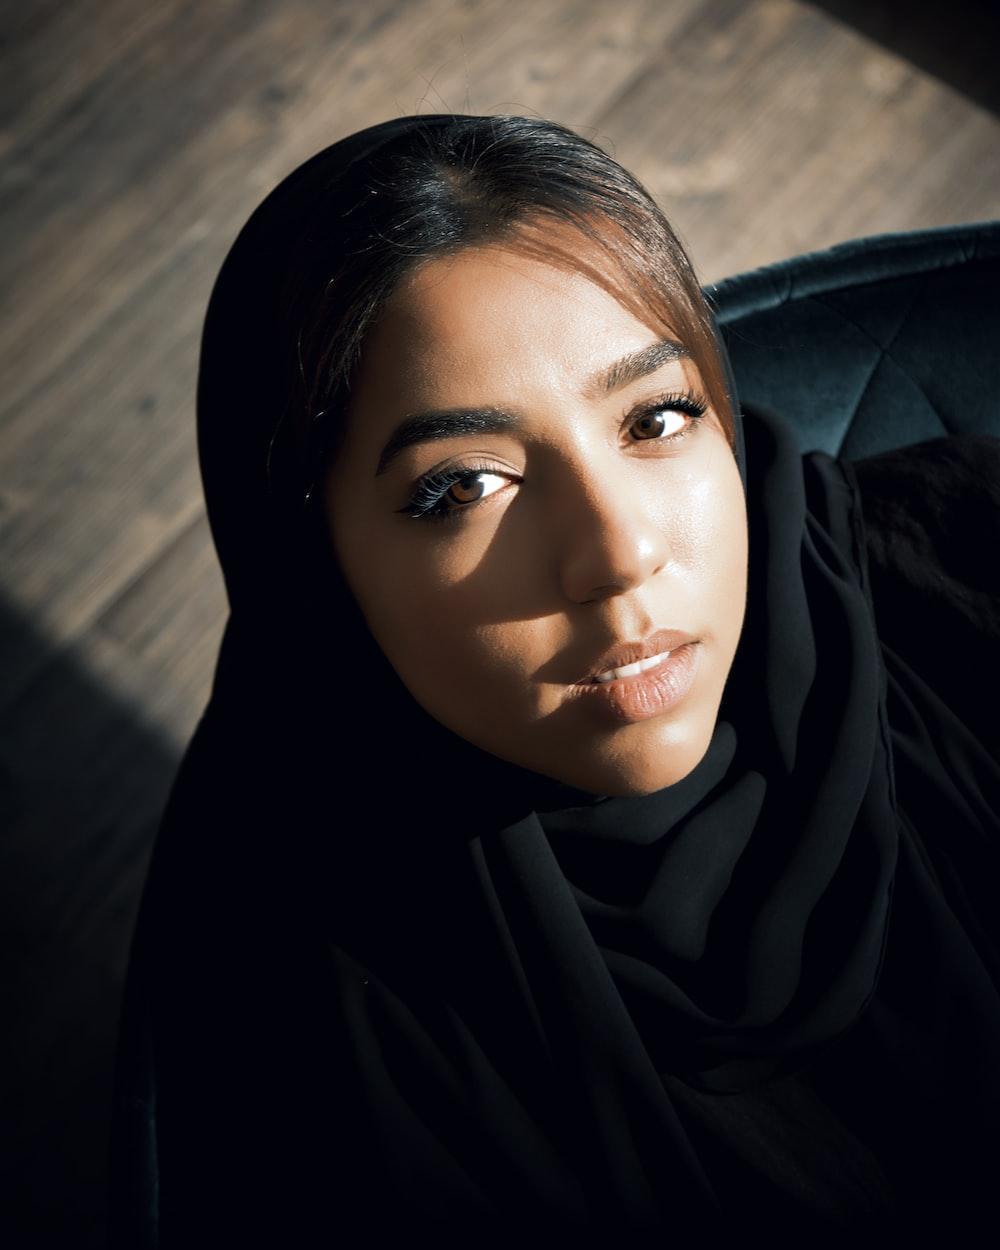 woman in black hijab taking selfie